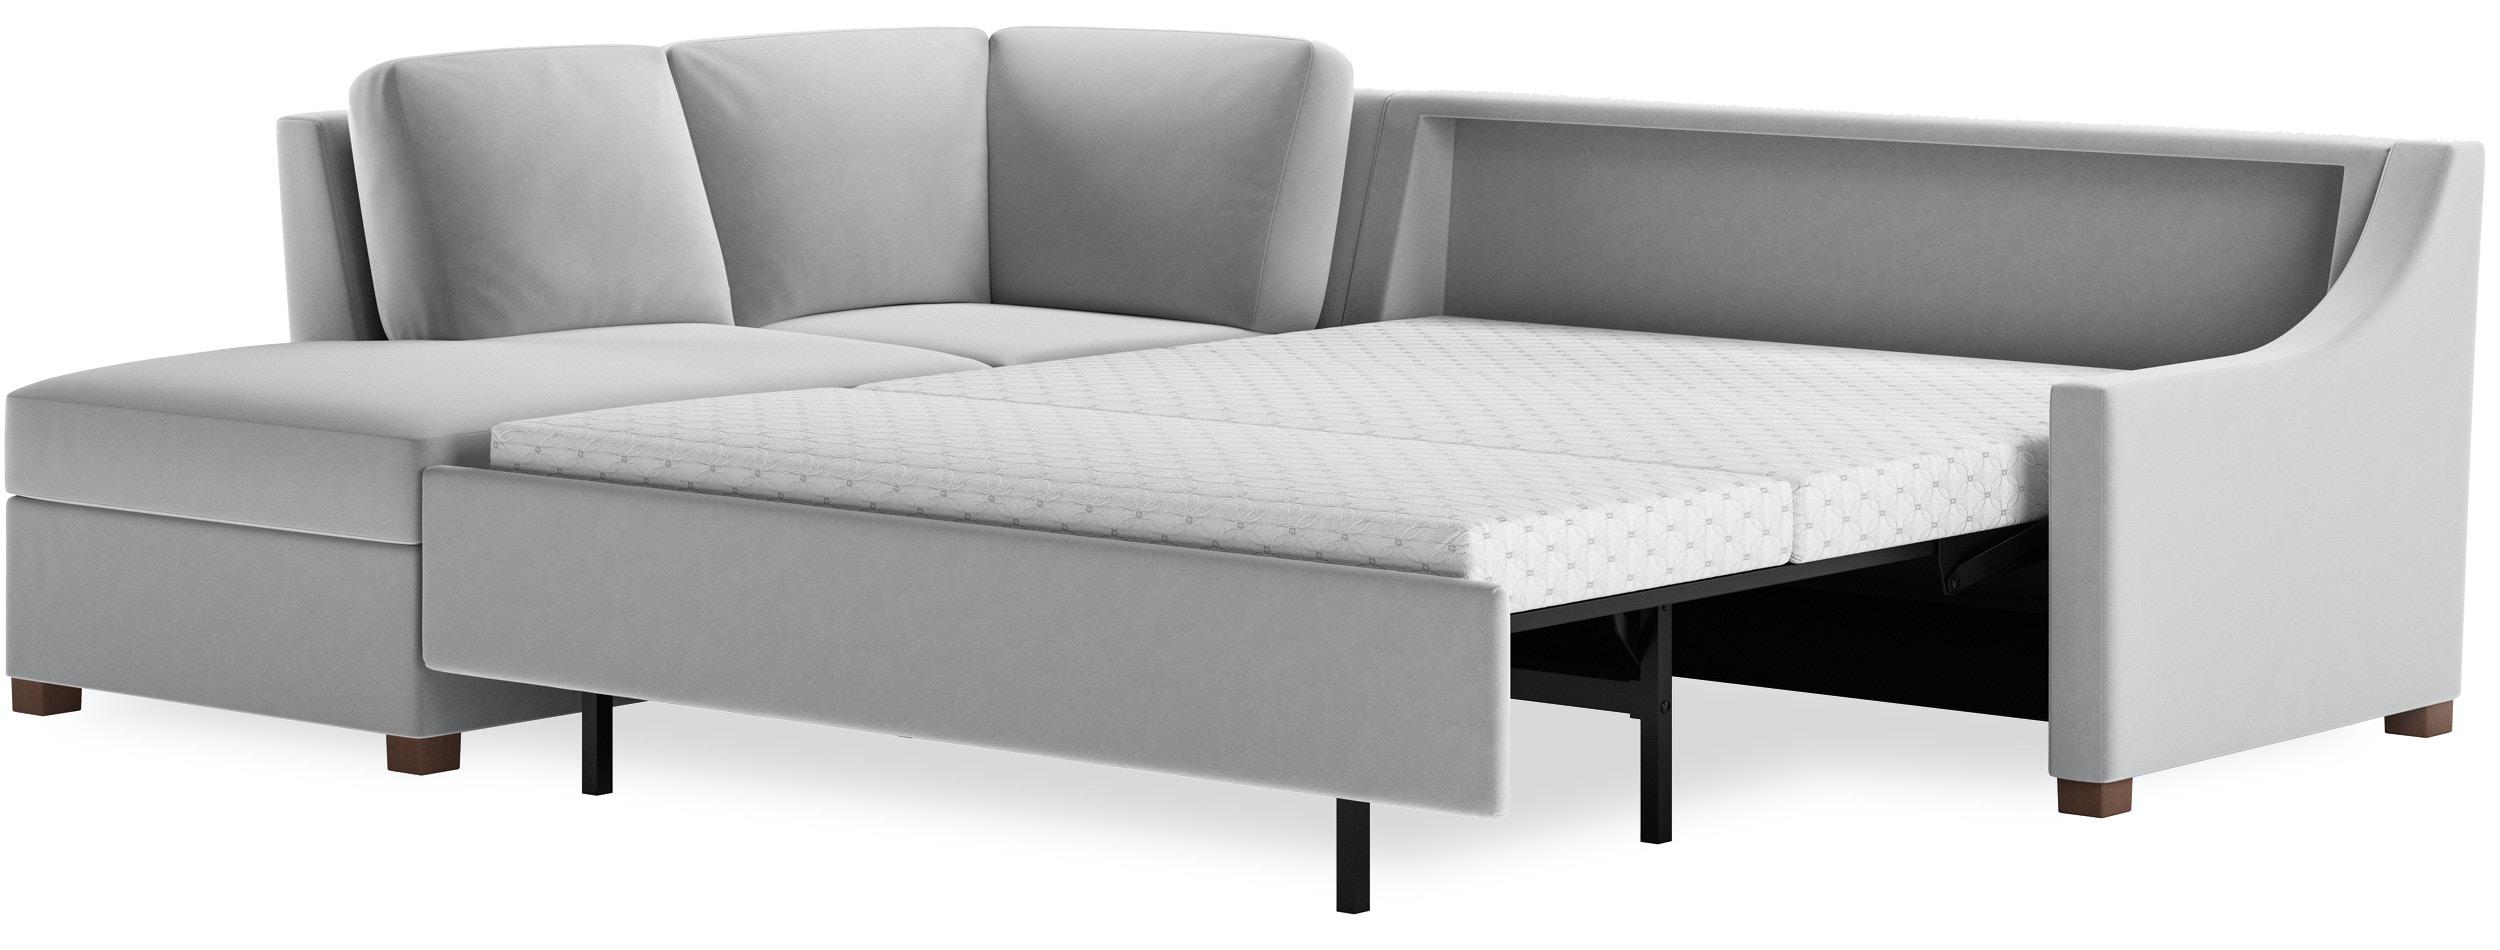 american leather living room perry comfort sleeper sofa pry so3 ks rh mountaincomfort com comfy leather sleeper sofa Oversized Comfy Sofa